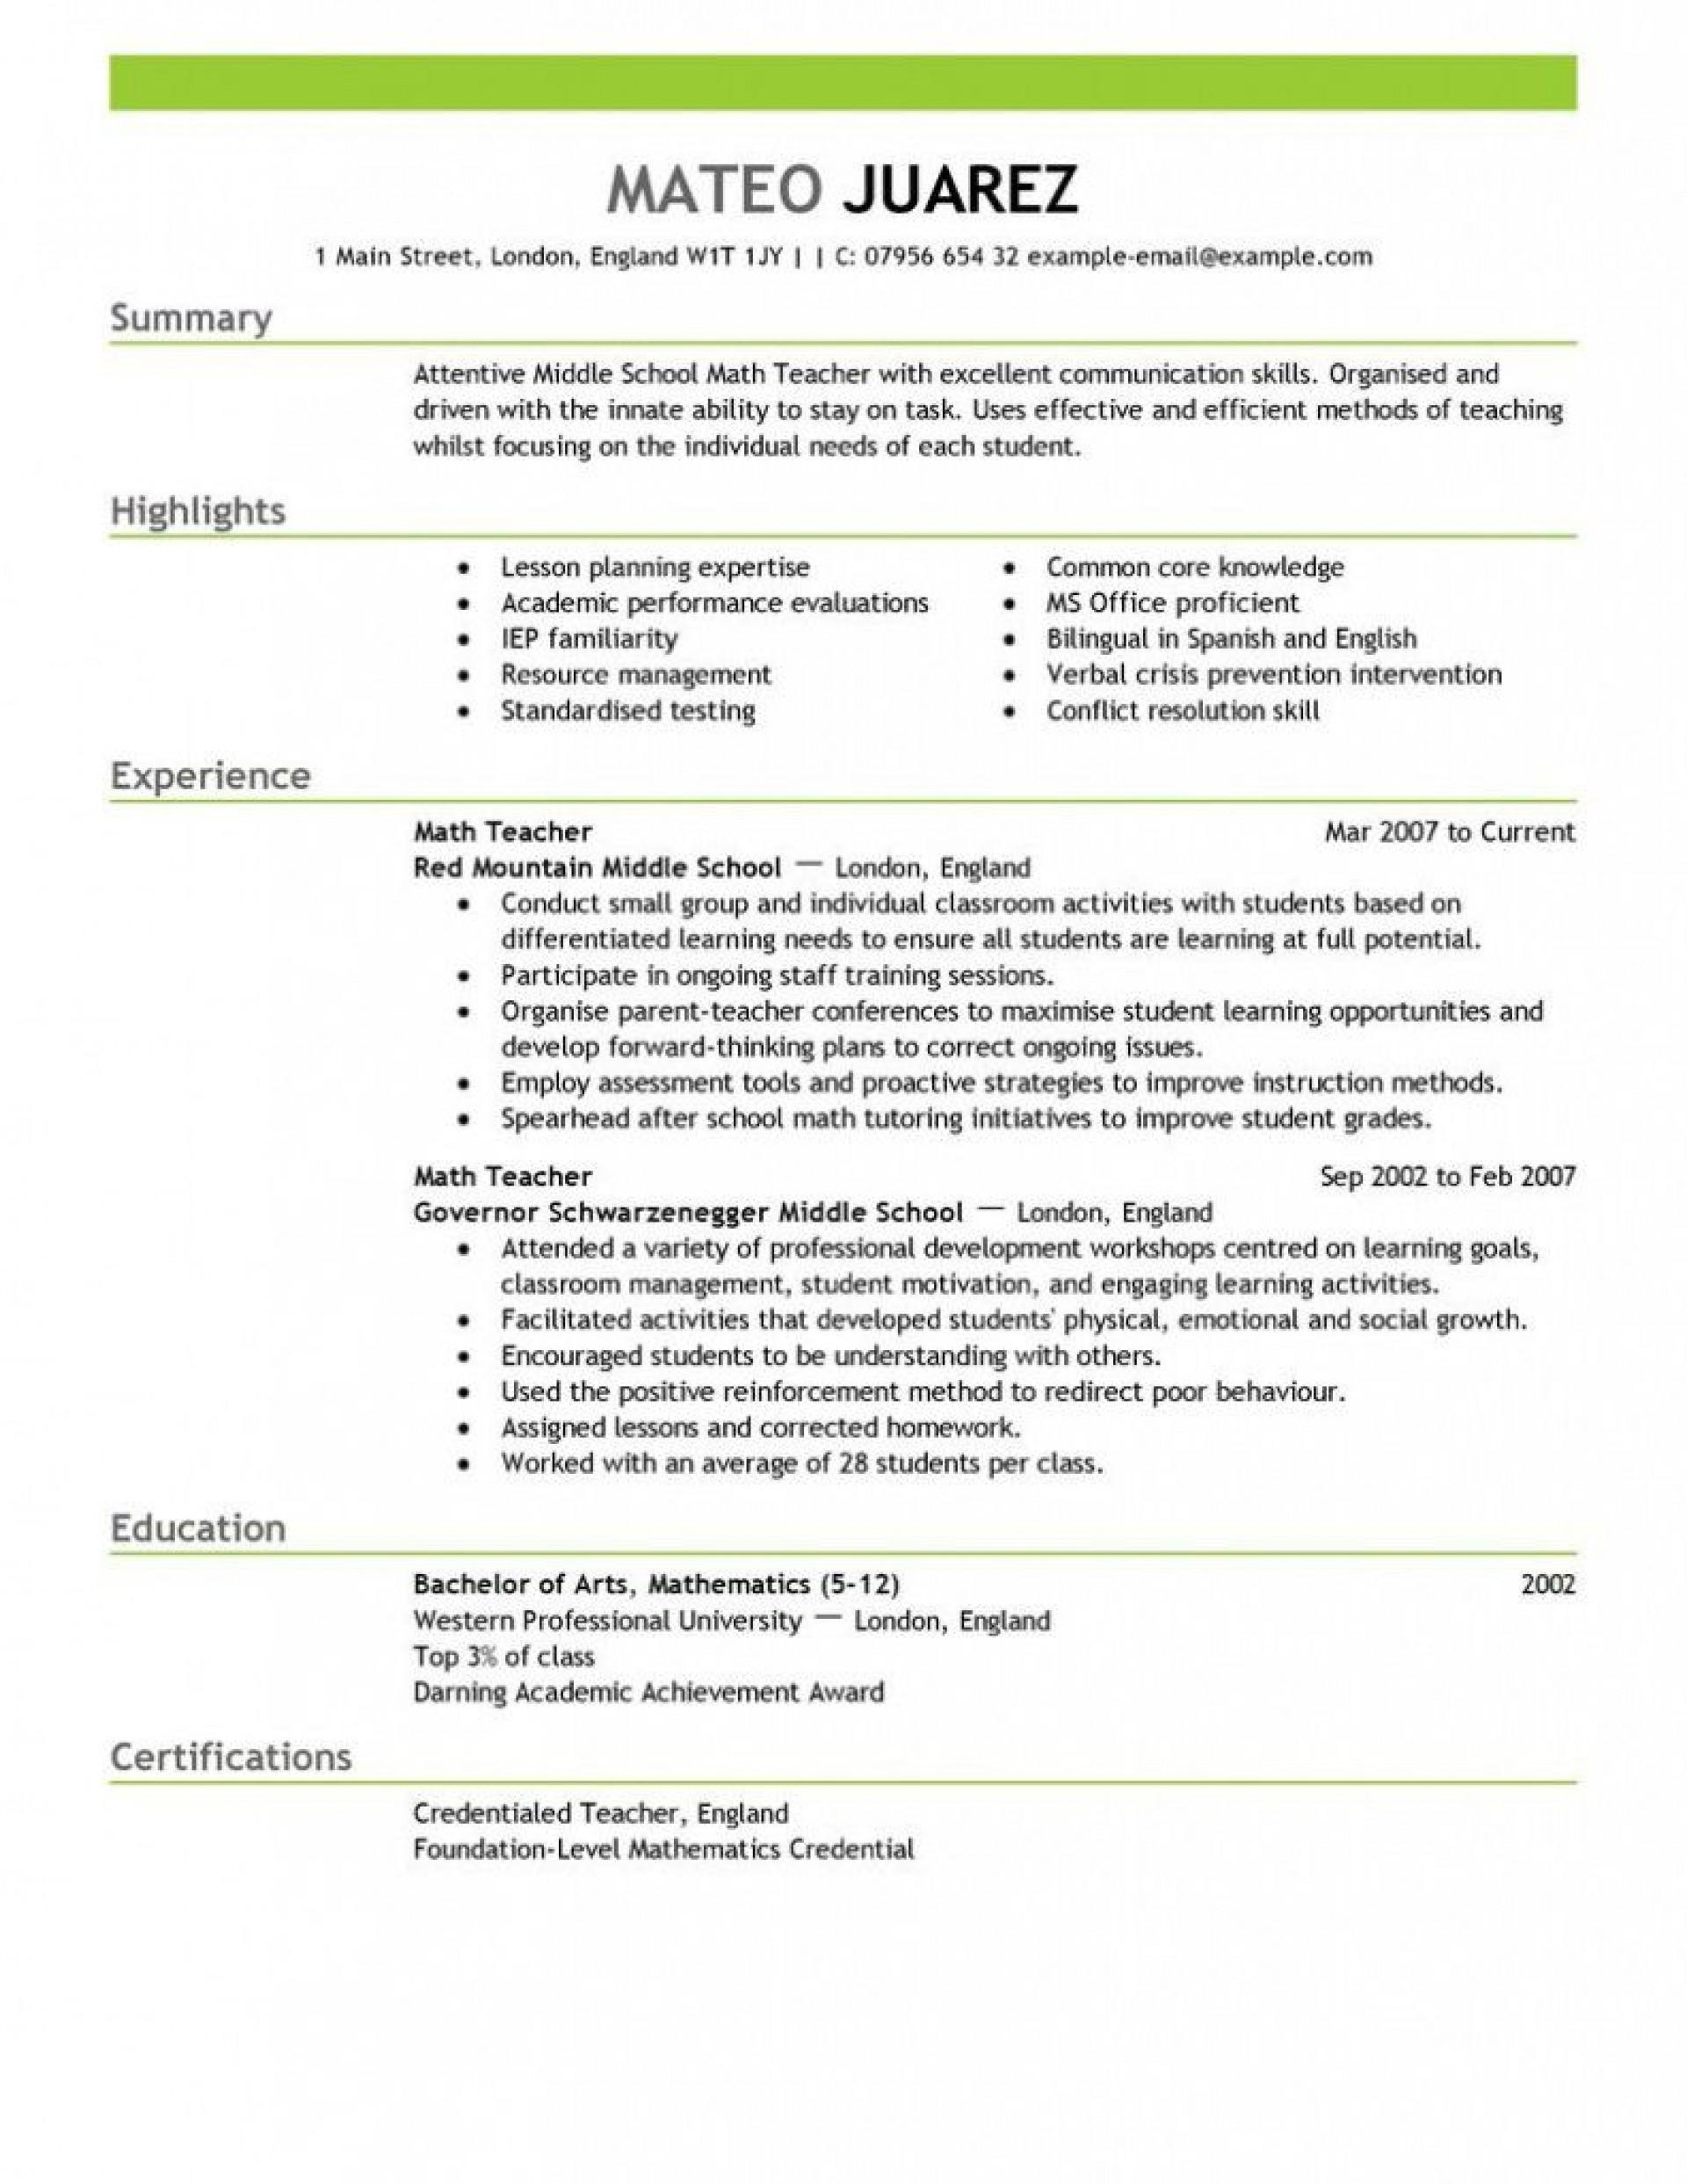 007 Sensational Teacher Resume Template Free Photo  Cv Word Download Editable Format Doc1920